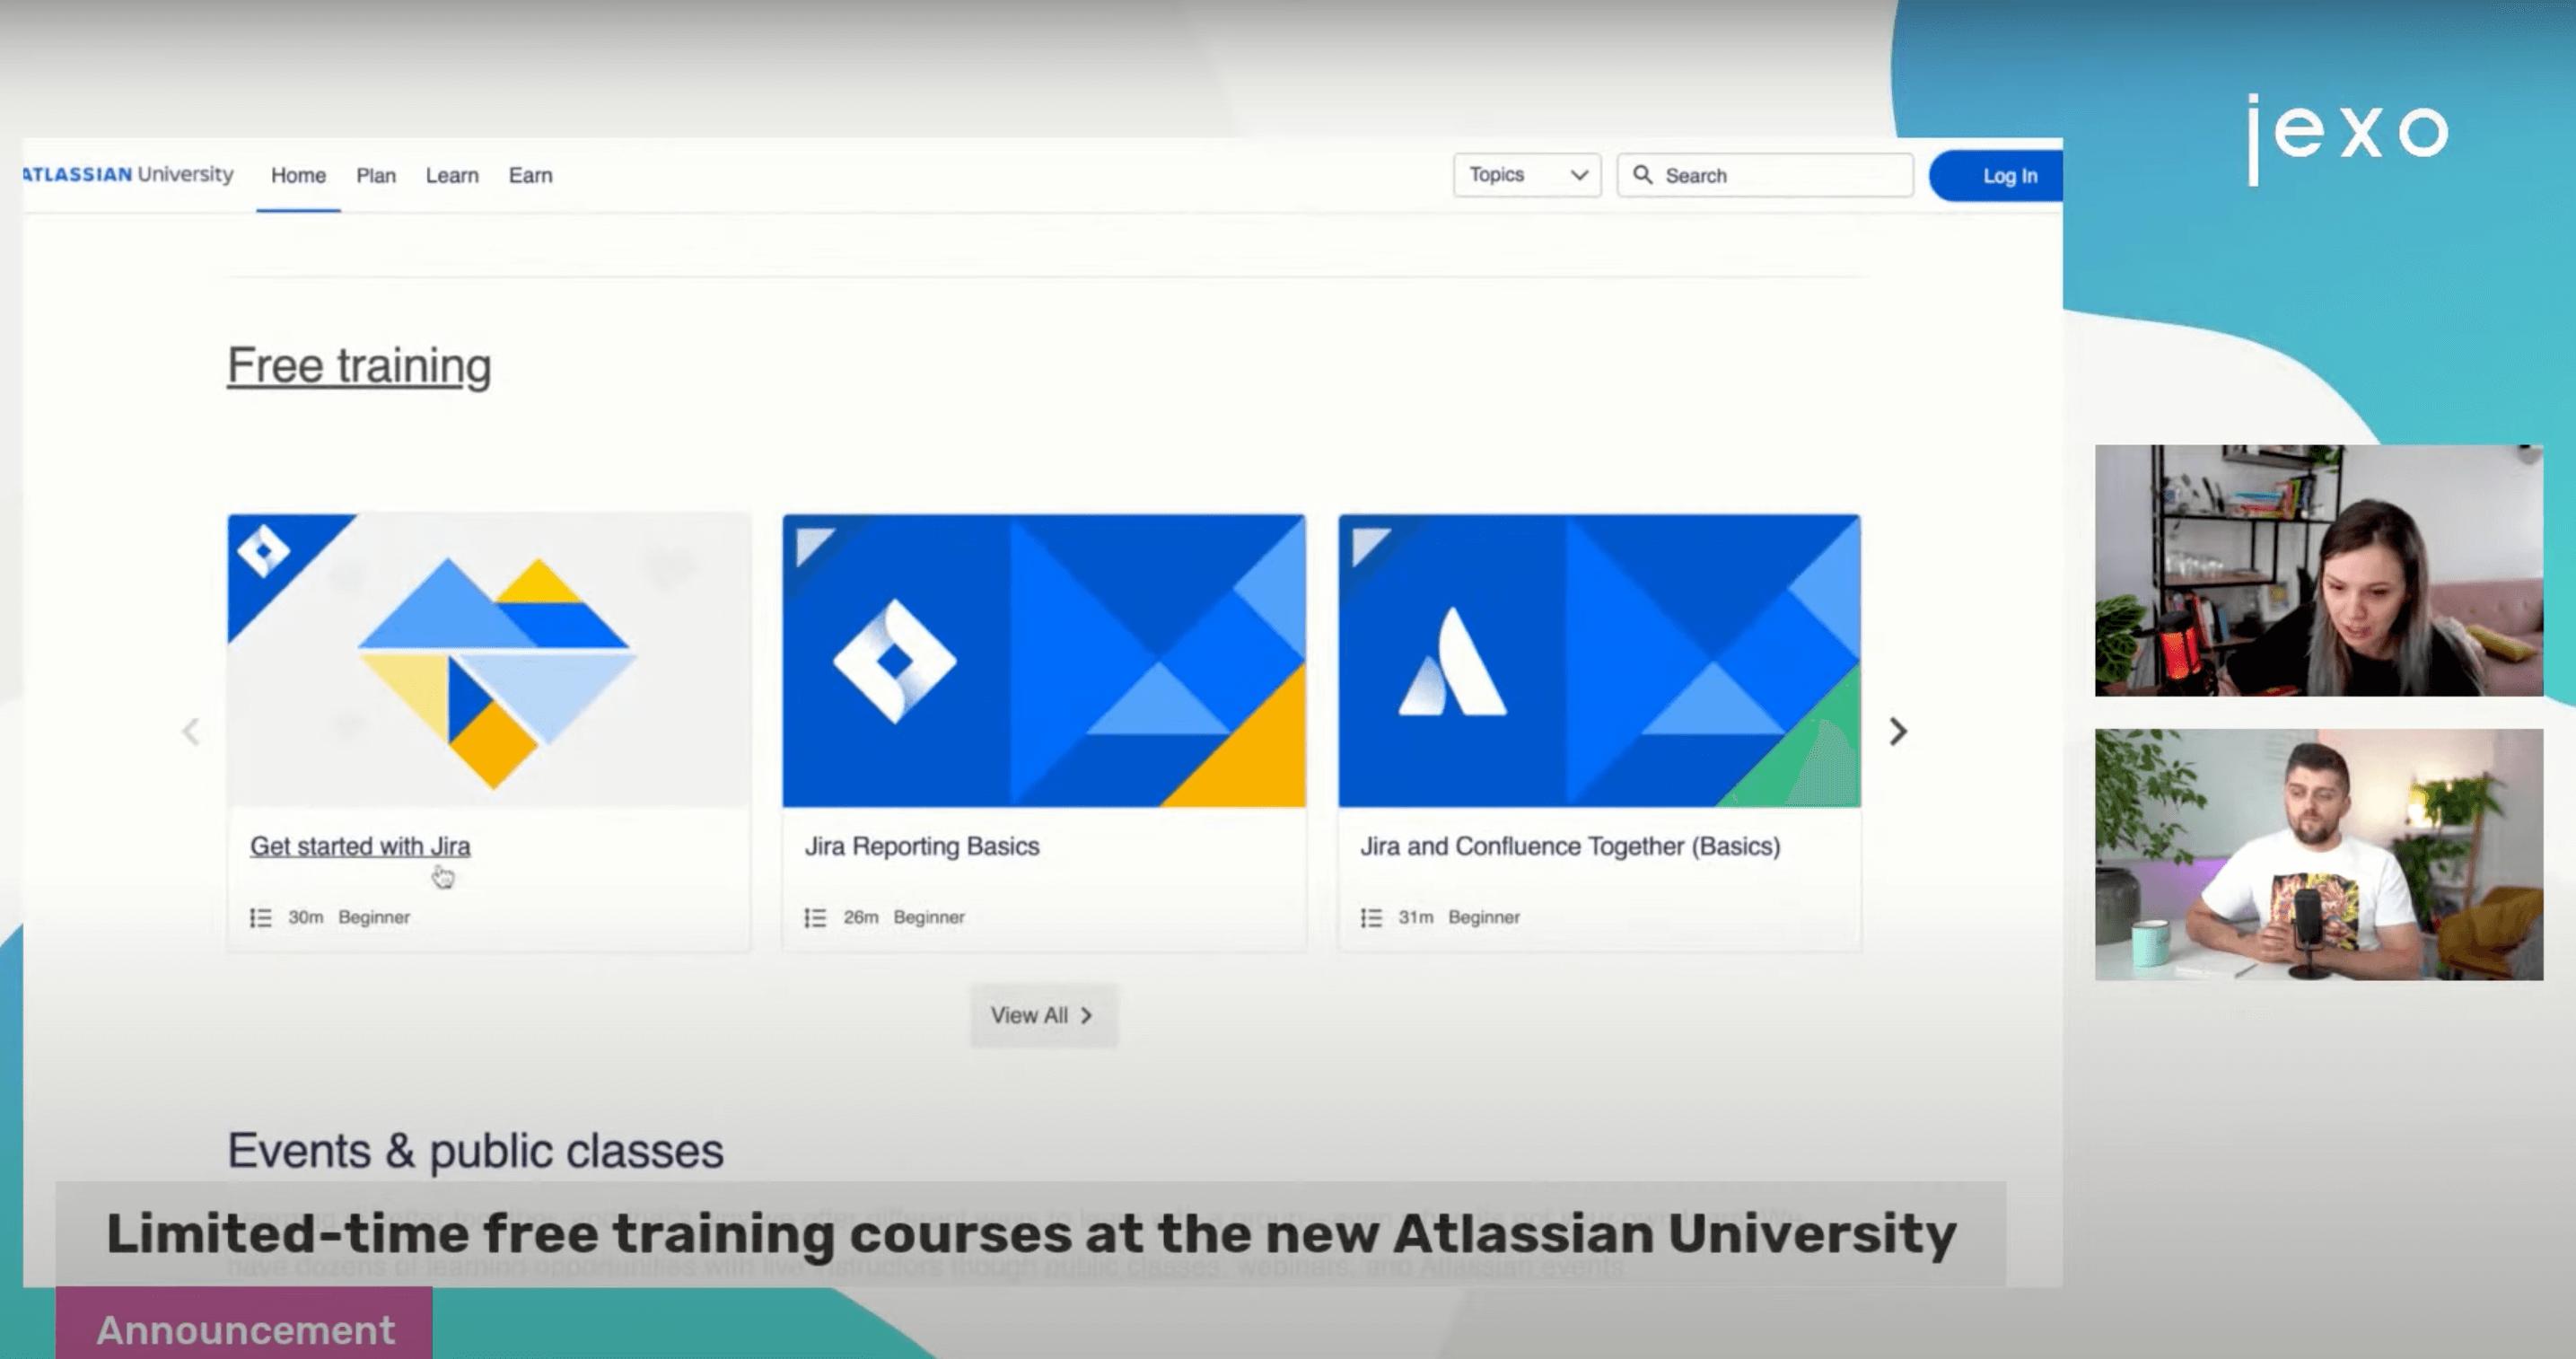 Free Atlassian courses in the new Atlassian university